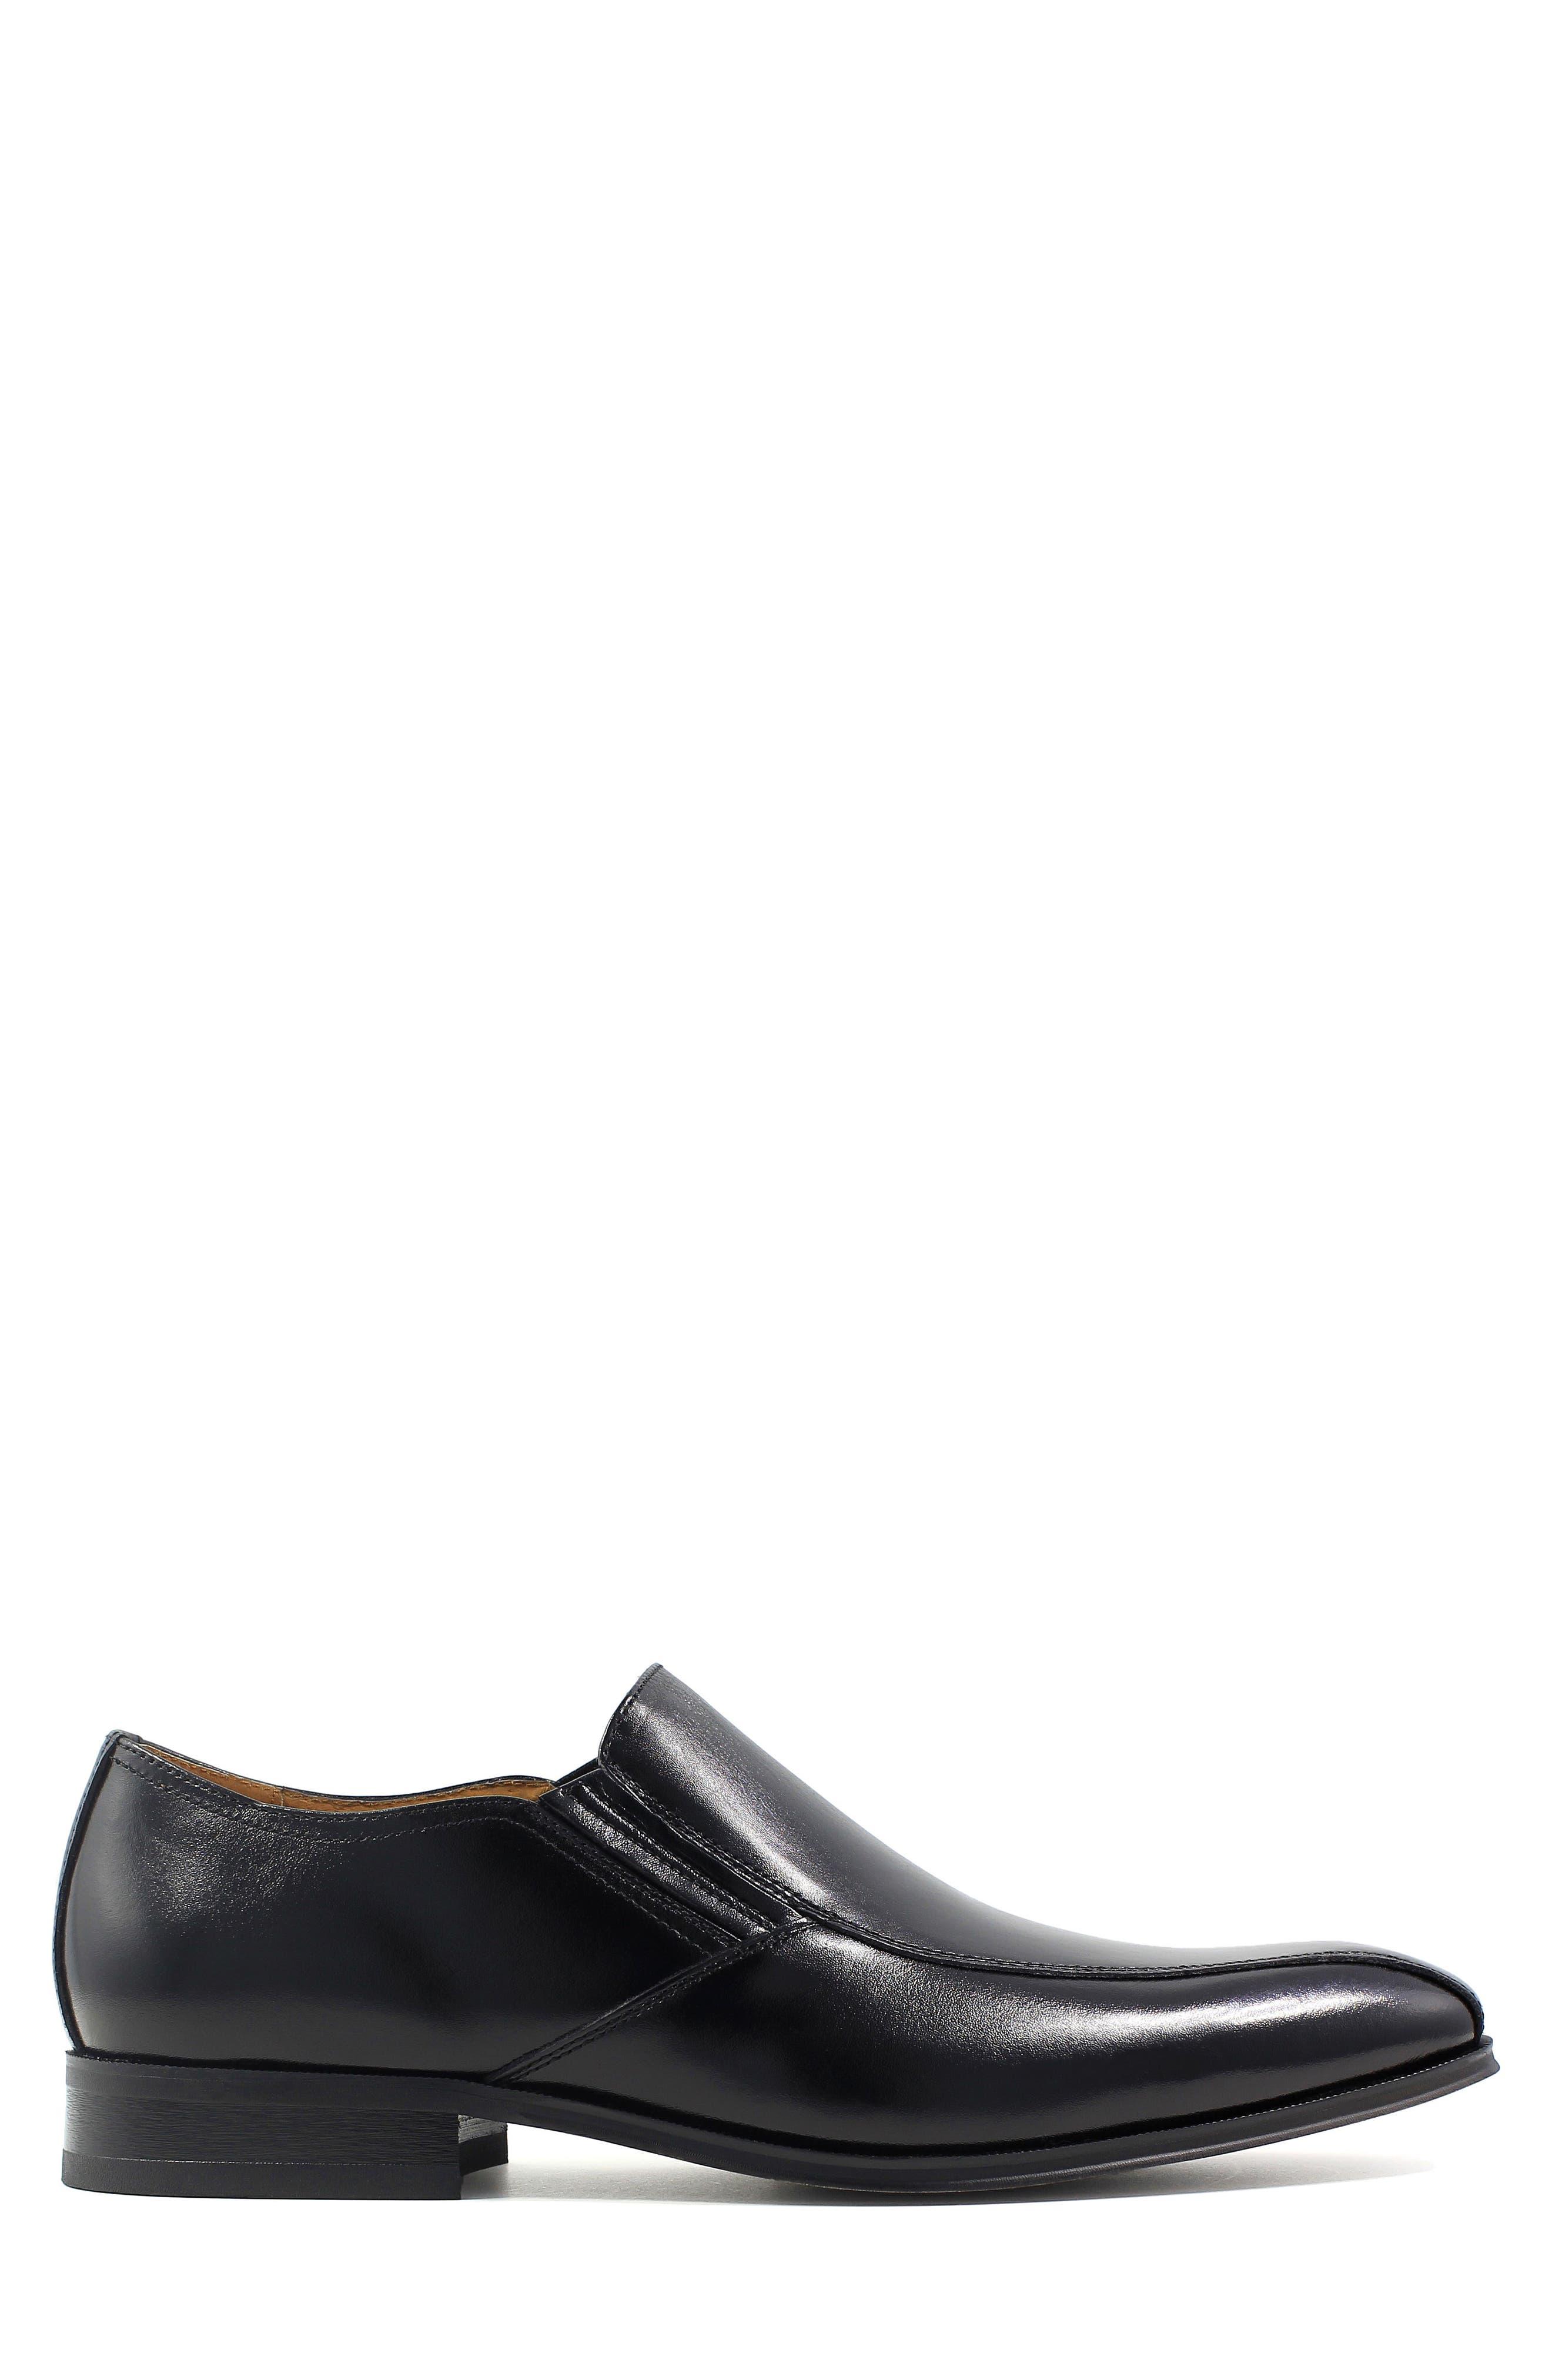 FLORSHEIM, Corbetta Venetian Loafer, Alternate thumbnail 3, color, BLACK